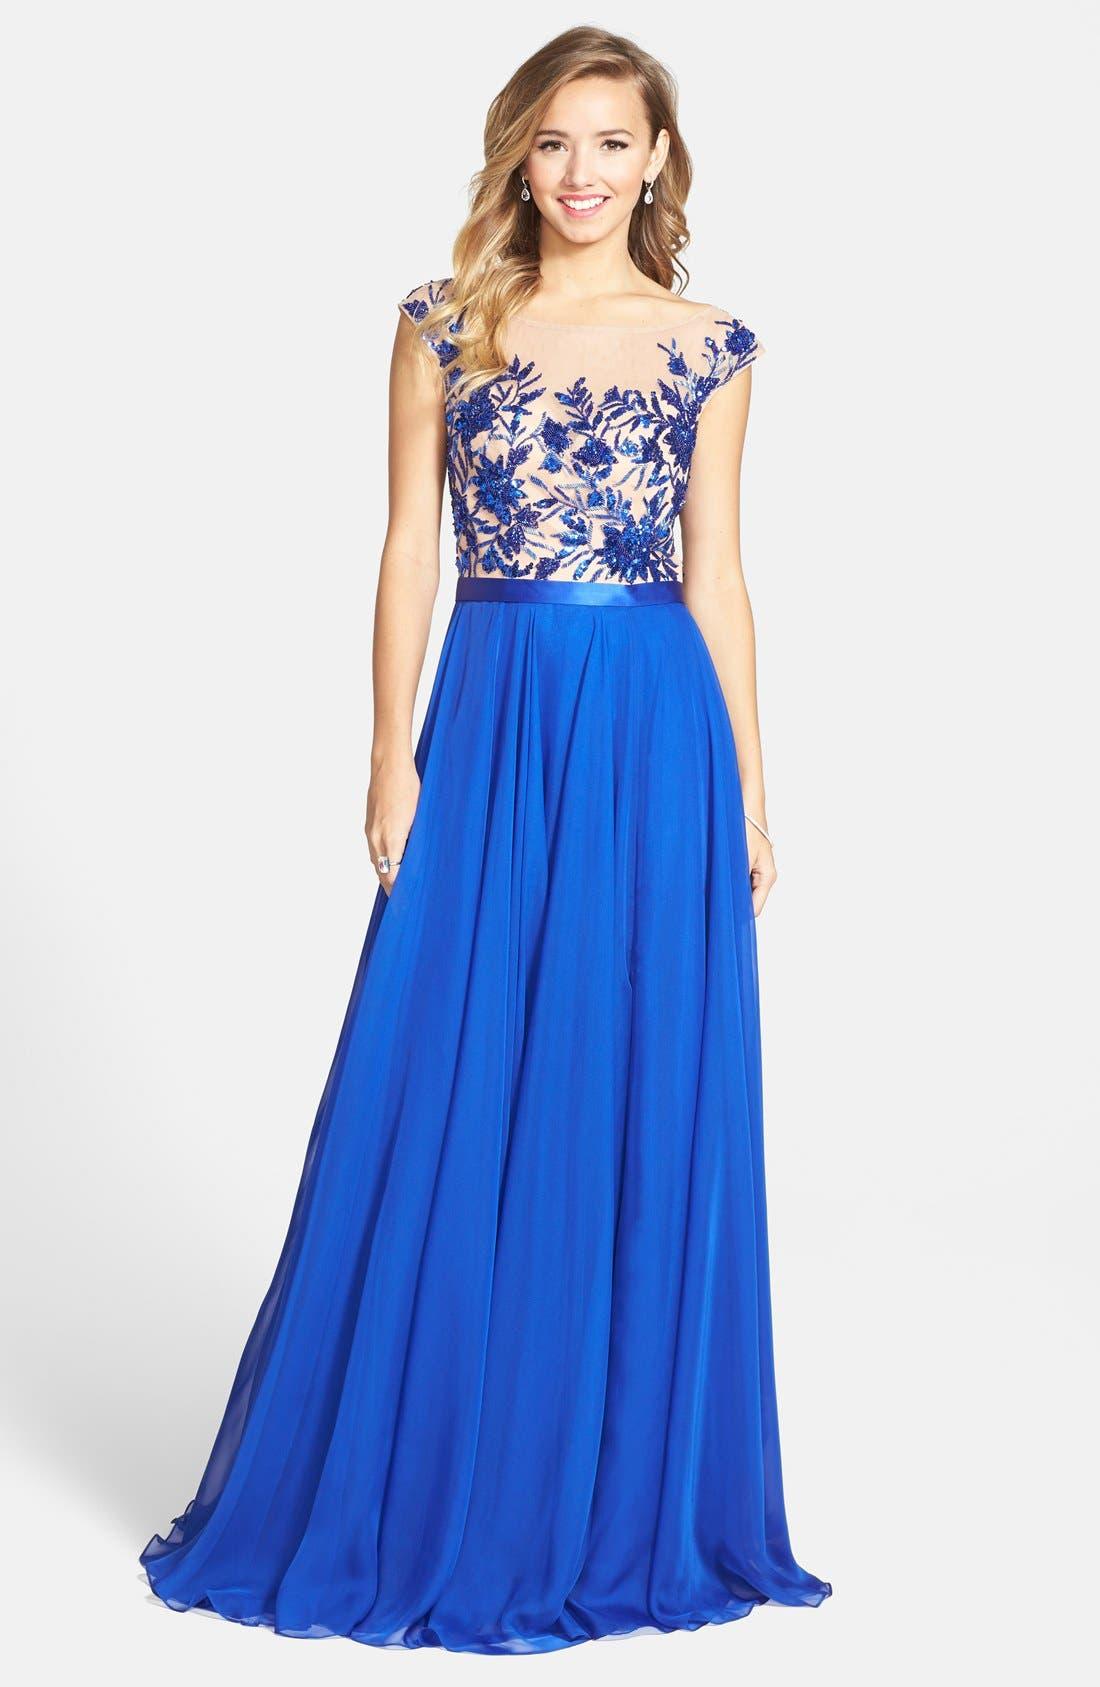 Main Image - Sherri Hill Embellished Illusion Gown